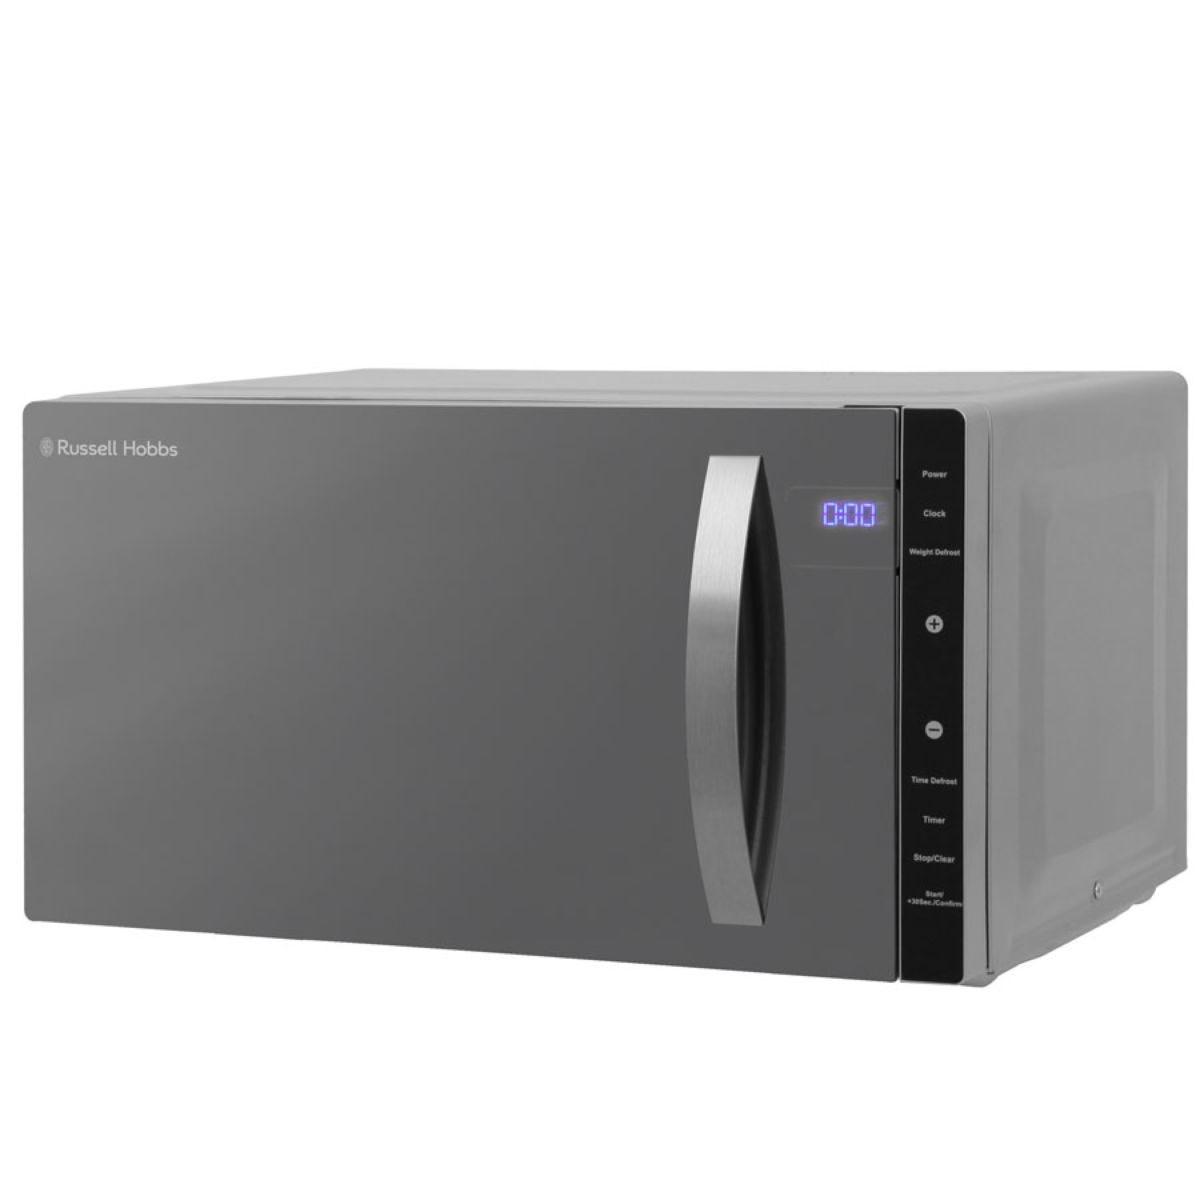 Russell Hobbs RHFM2363S 800W 23L Digital Flatbed Microwave – Silver